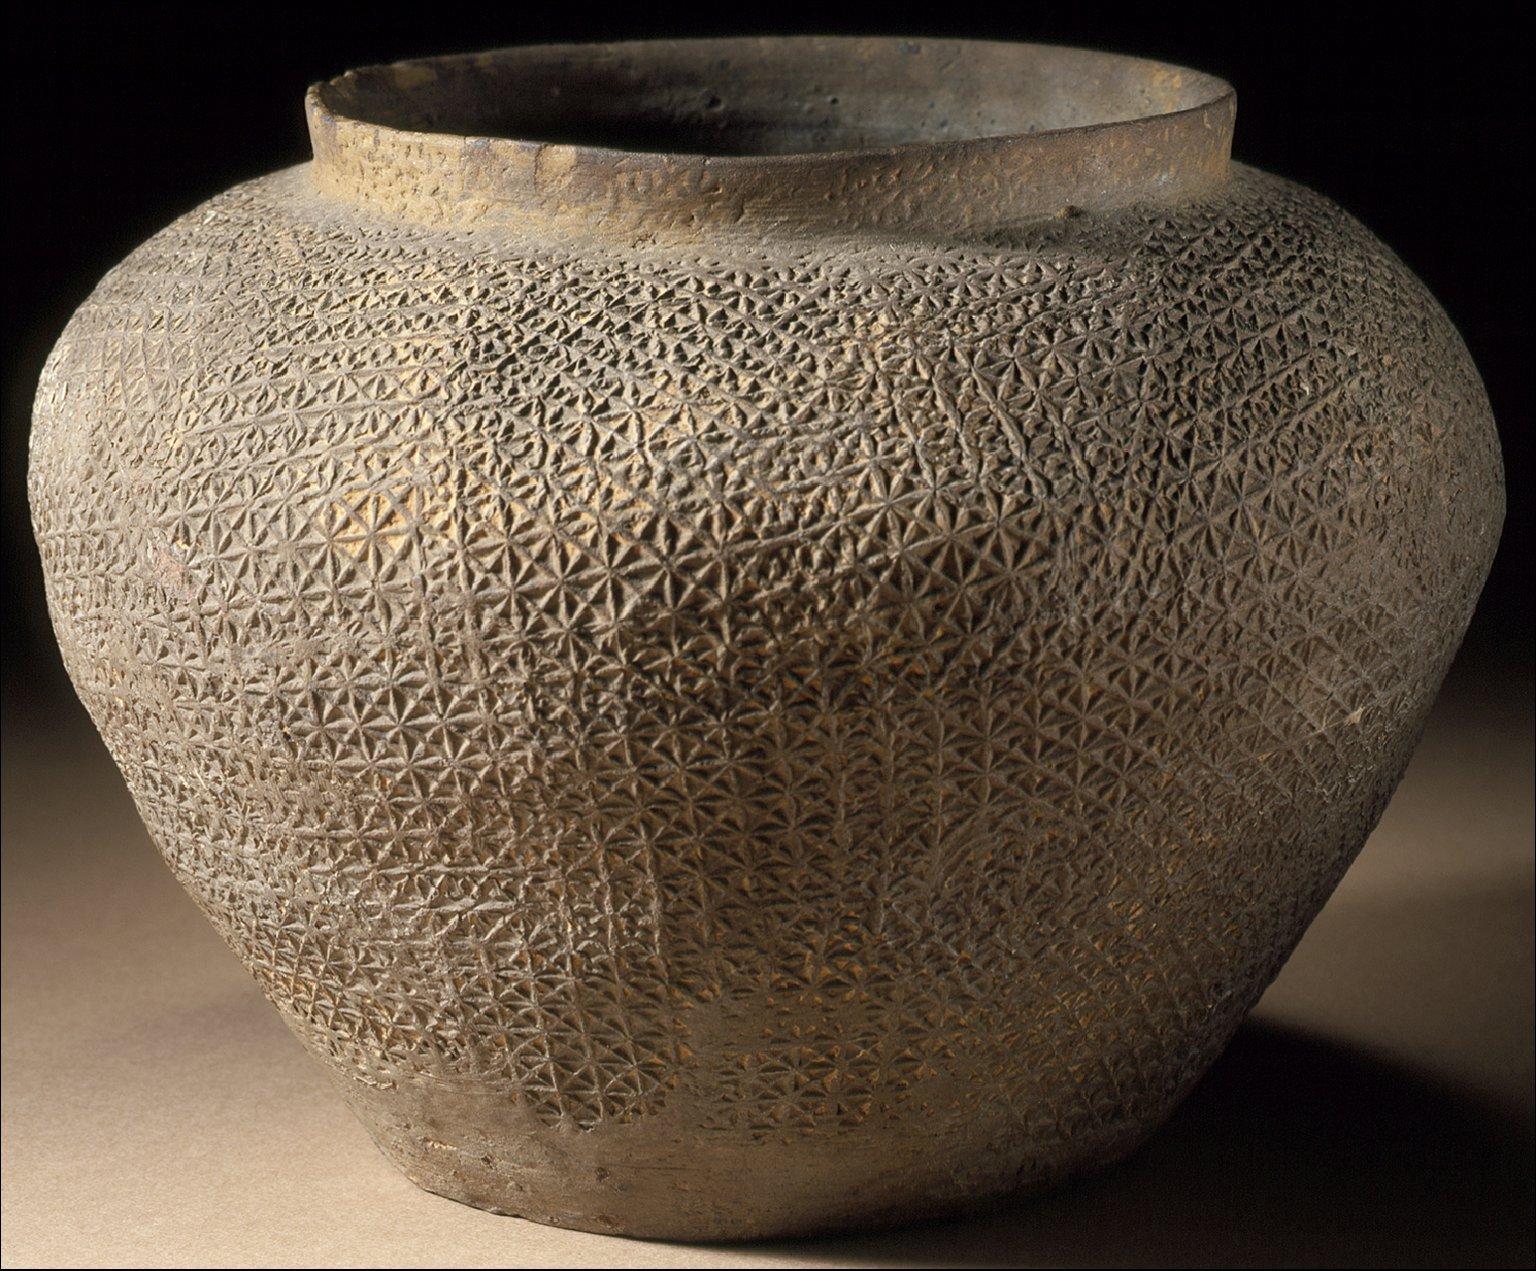 Jar (Guan) with Textured Surface